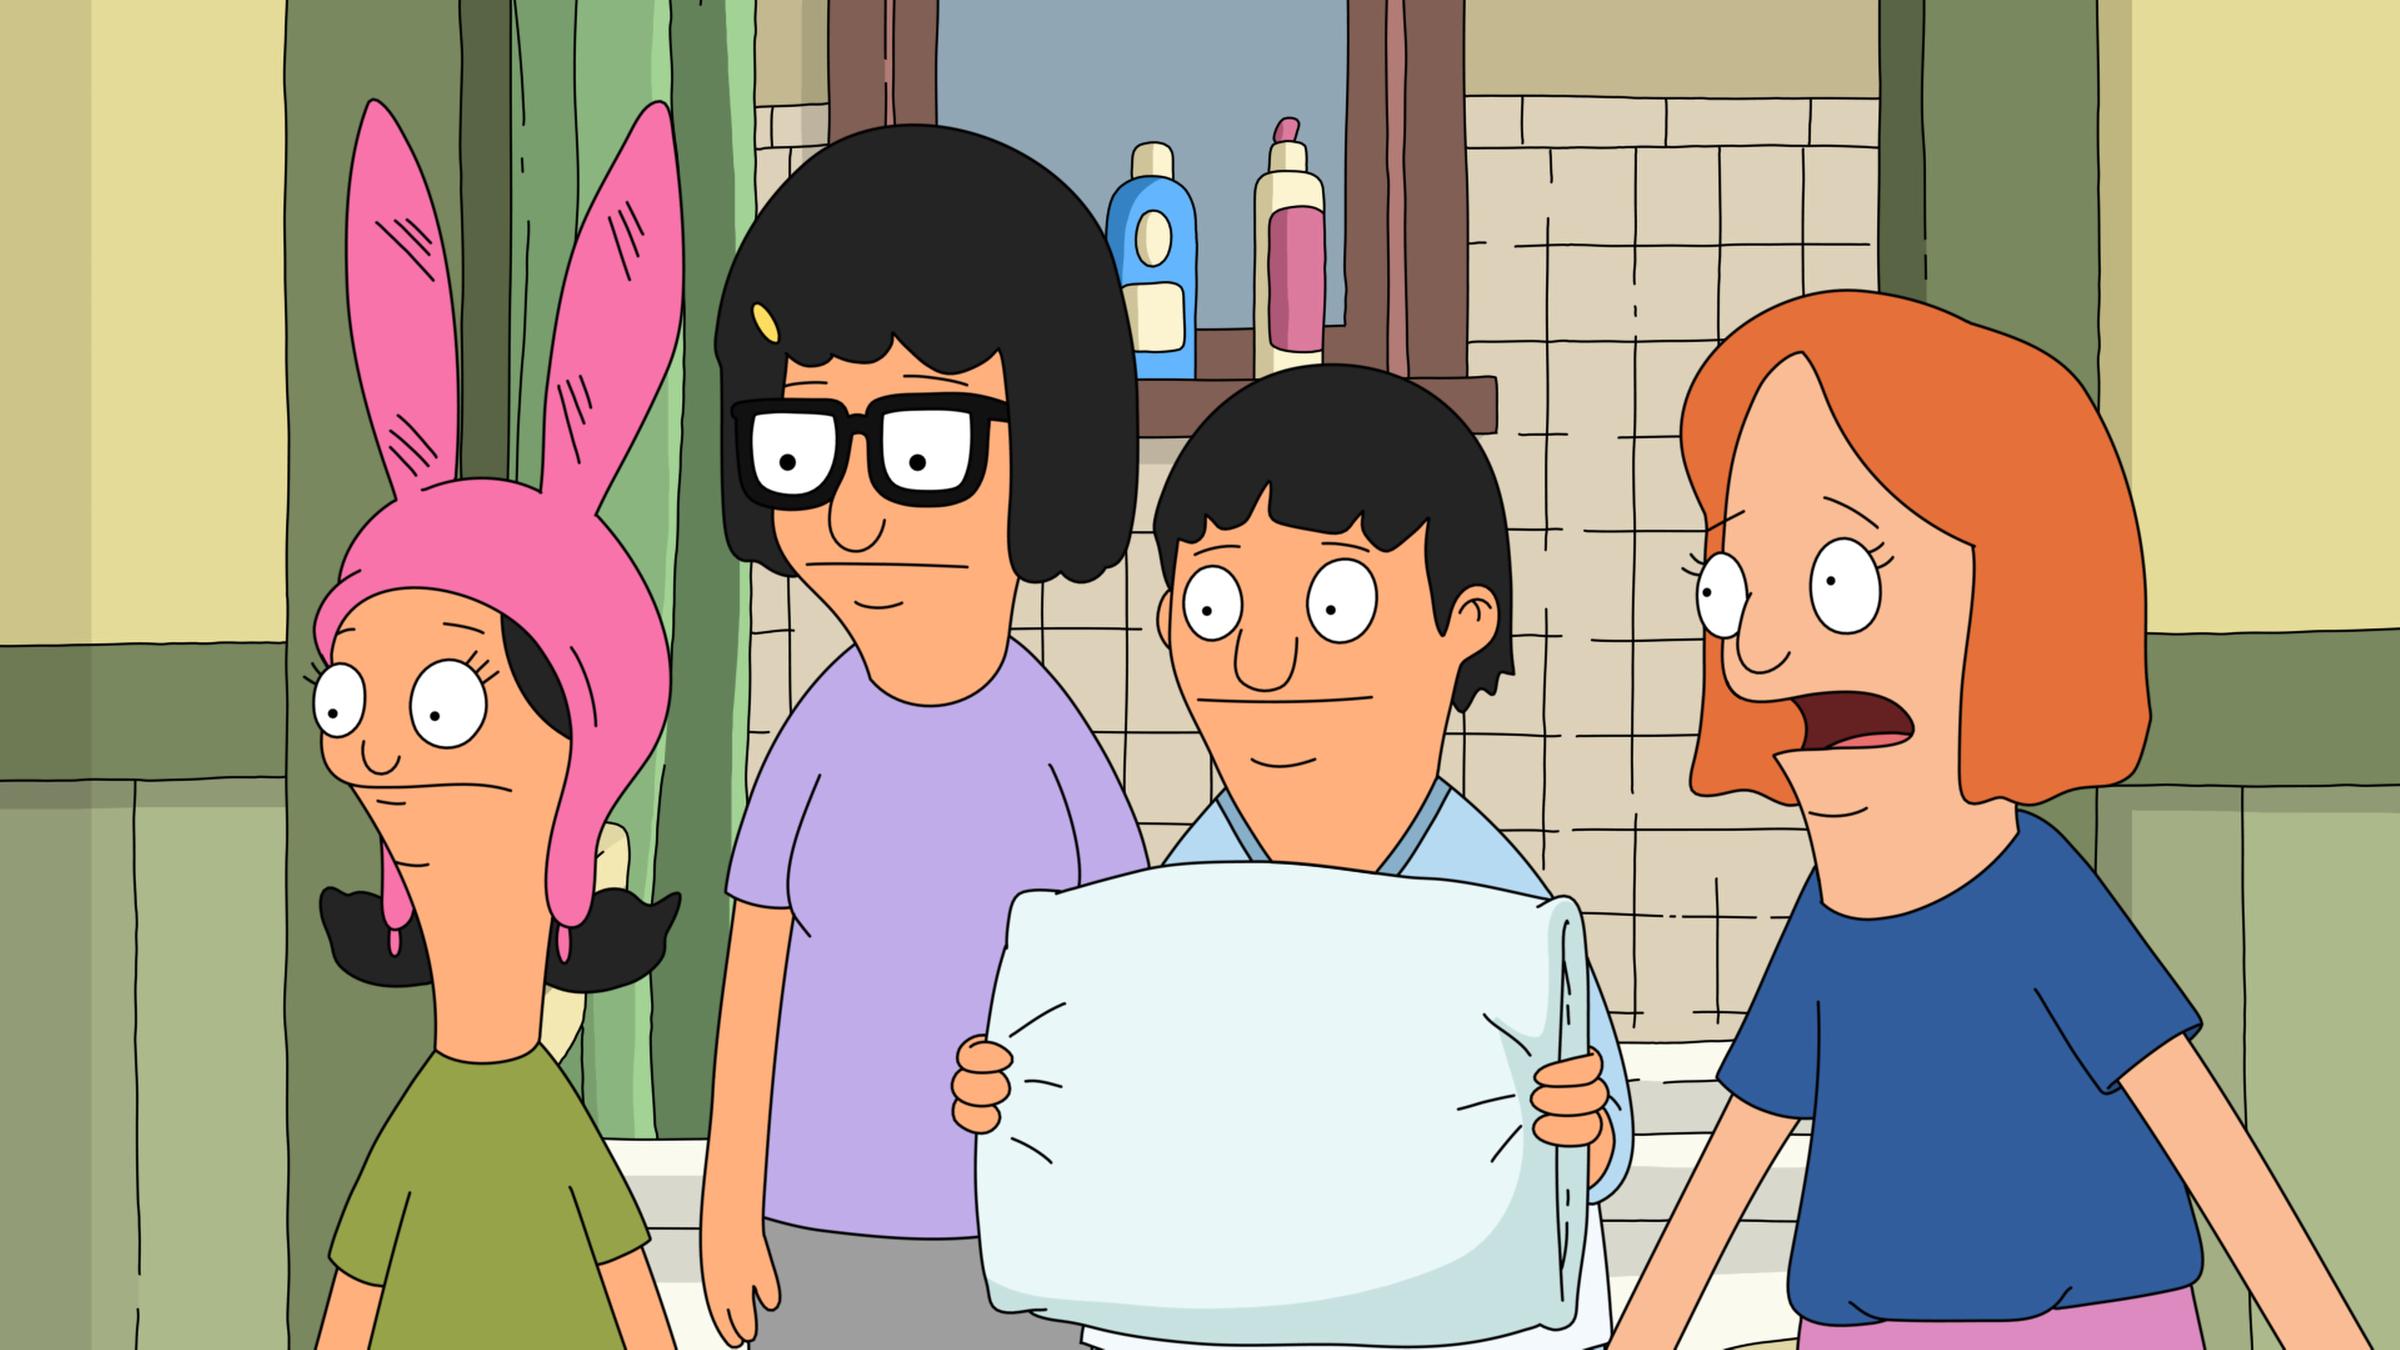 bobs burgers season 4 episode 1 online free